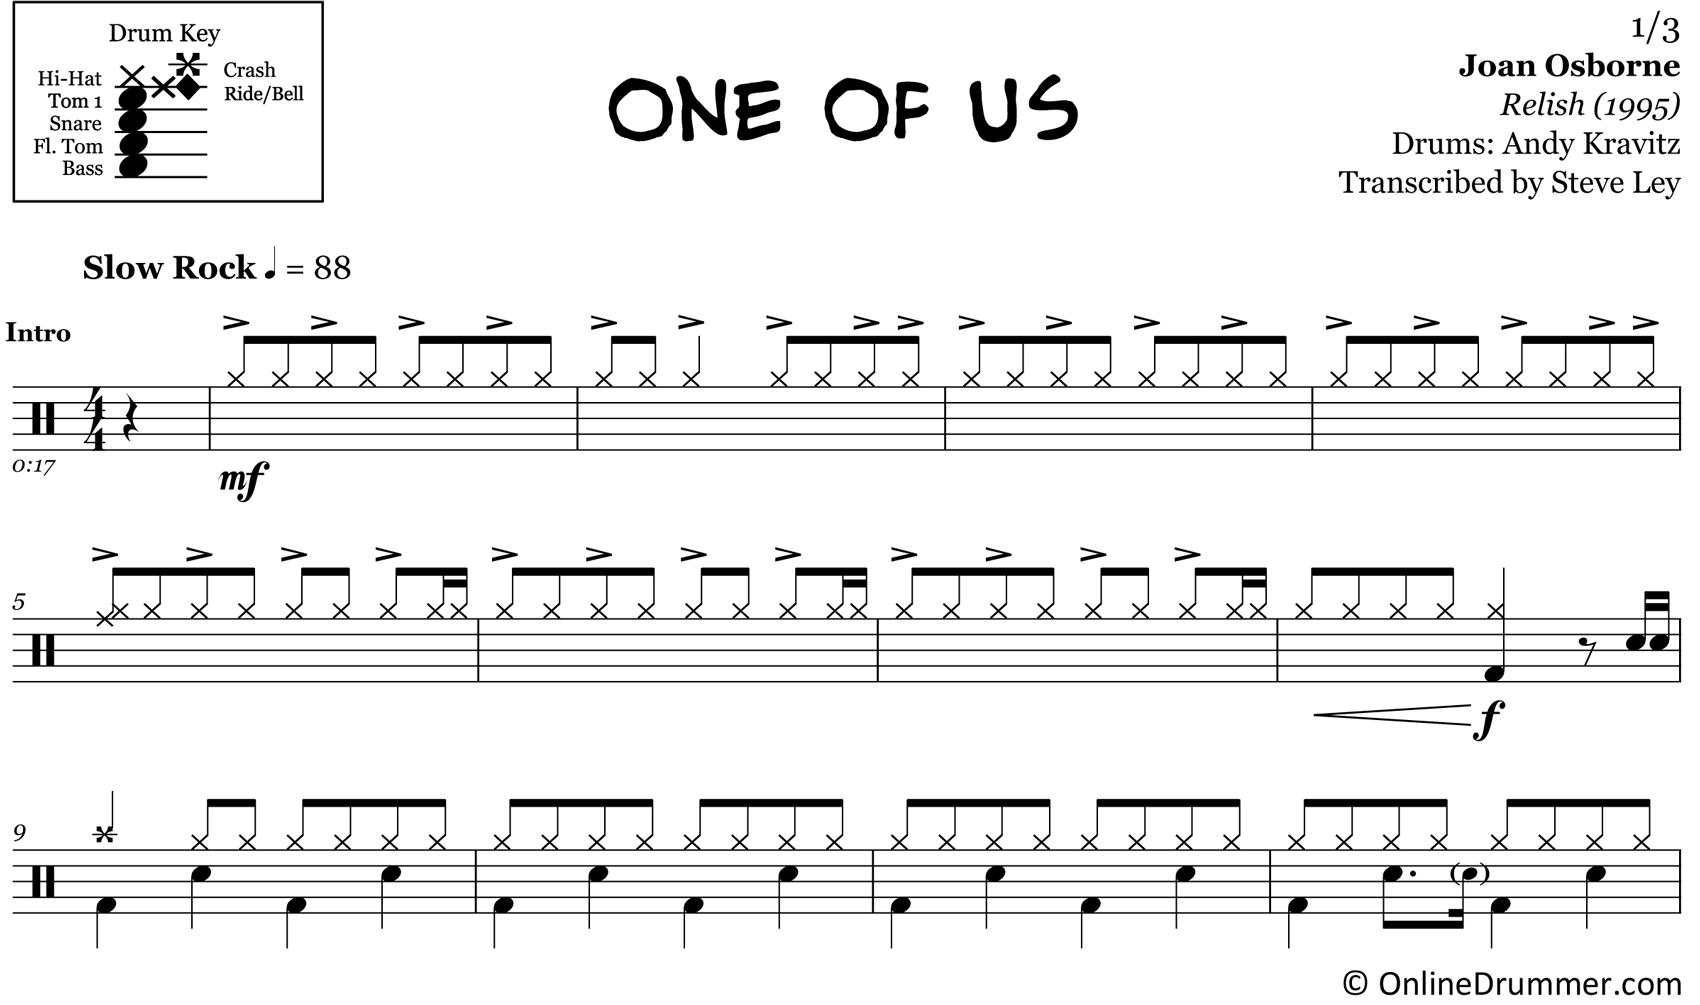 One of Us - Joan Osborne - Drum Sheet Music